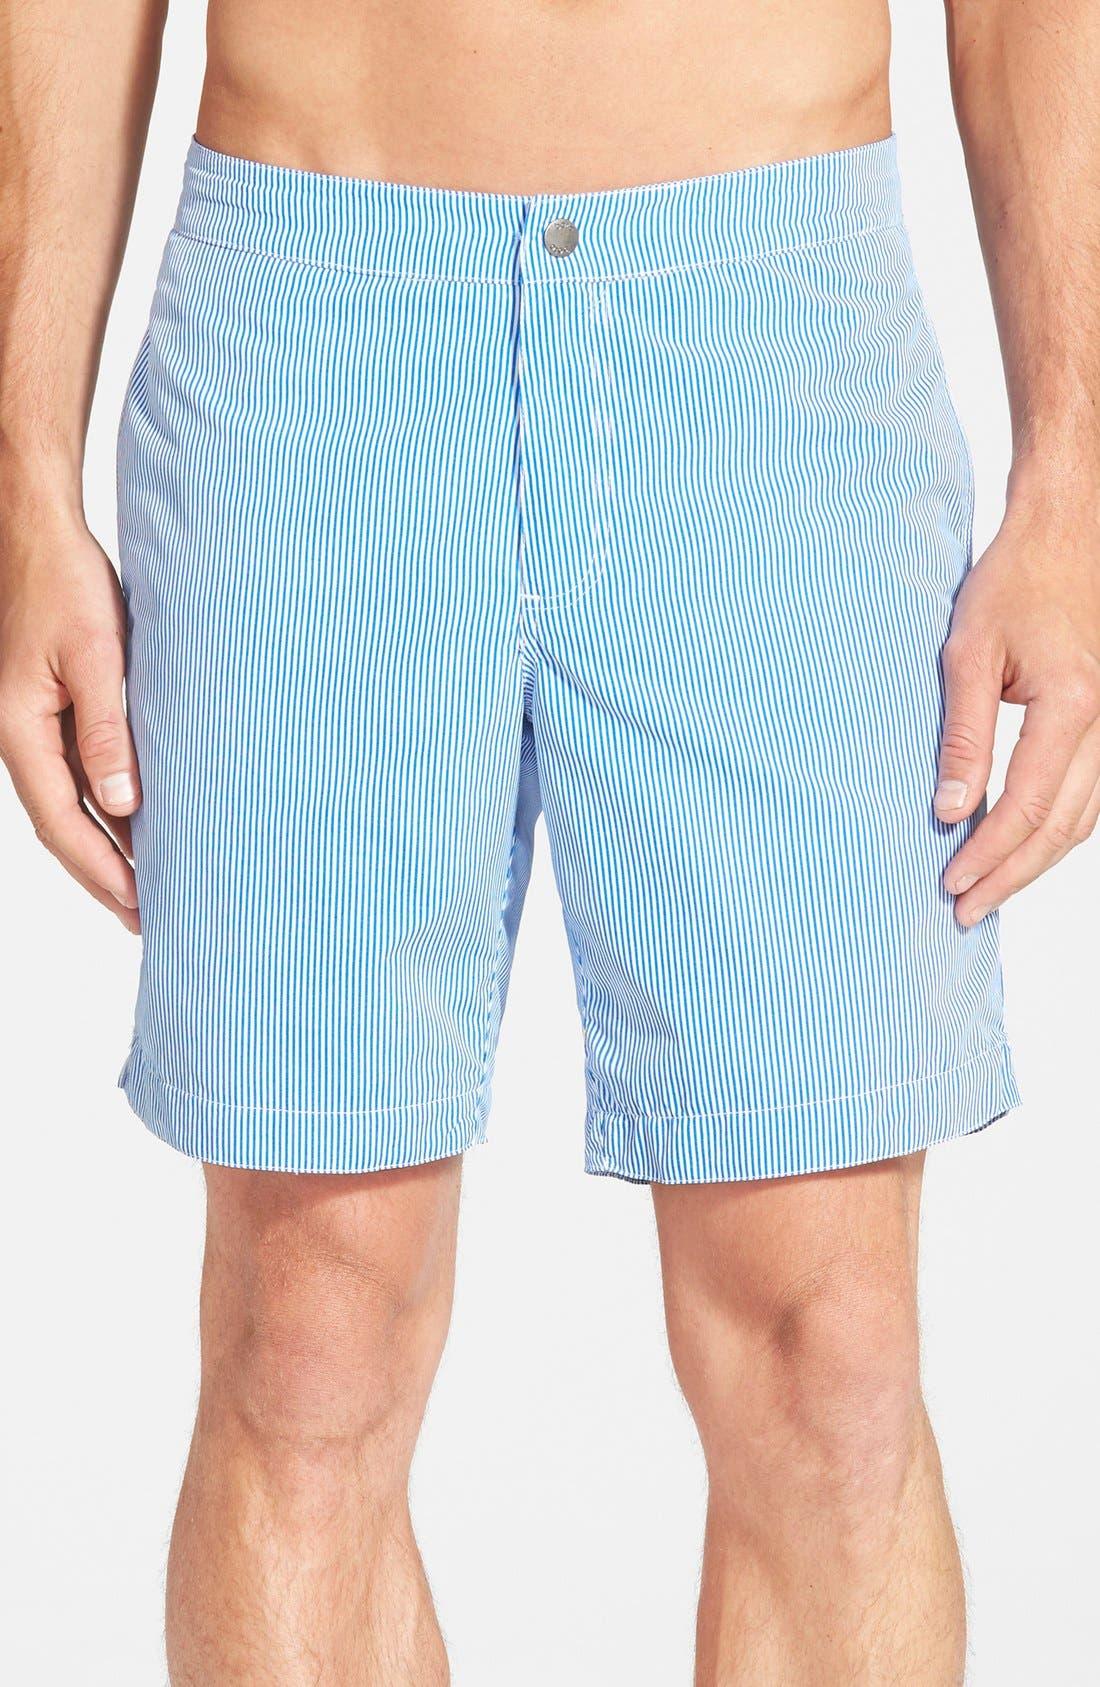 Main Image - boto 'Aruba - Stripe' Tailored Fit 8.5 Inch Board Shorts